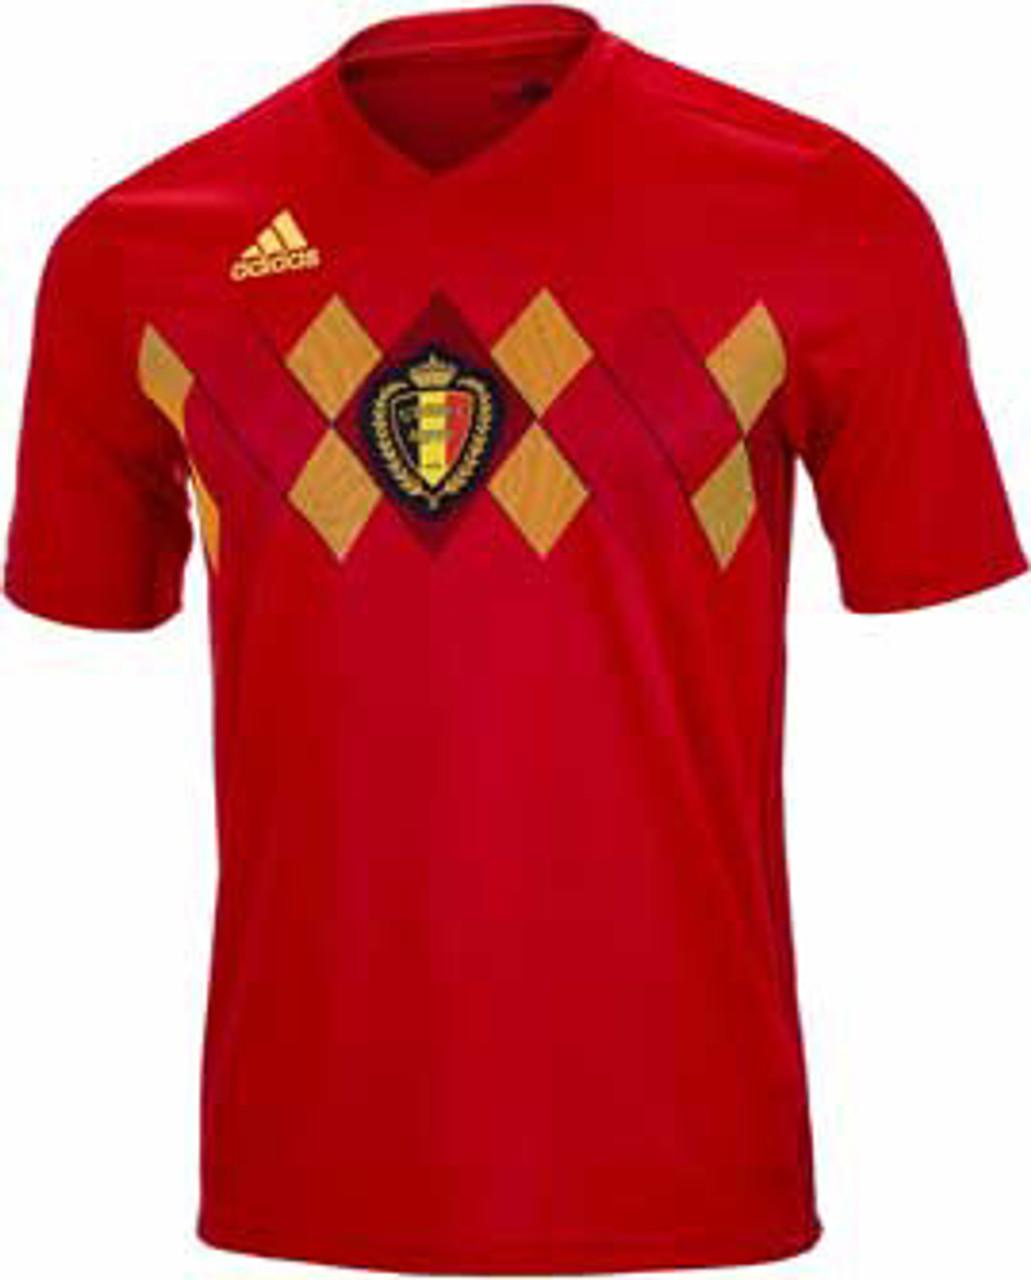 bf69ac0889e ADIDAS BELGIUM 2018 WORLD CUP HOME JERSEY - Soccer Plus